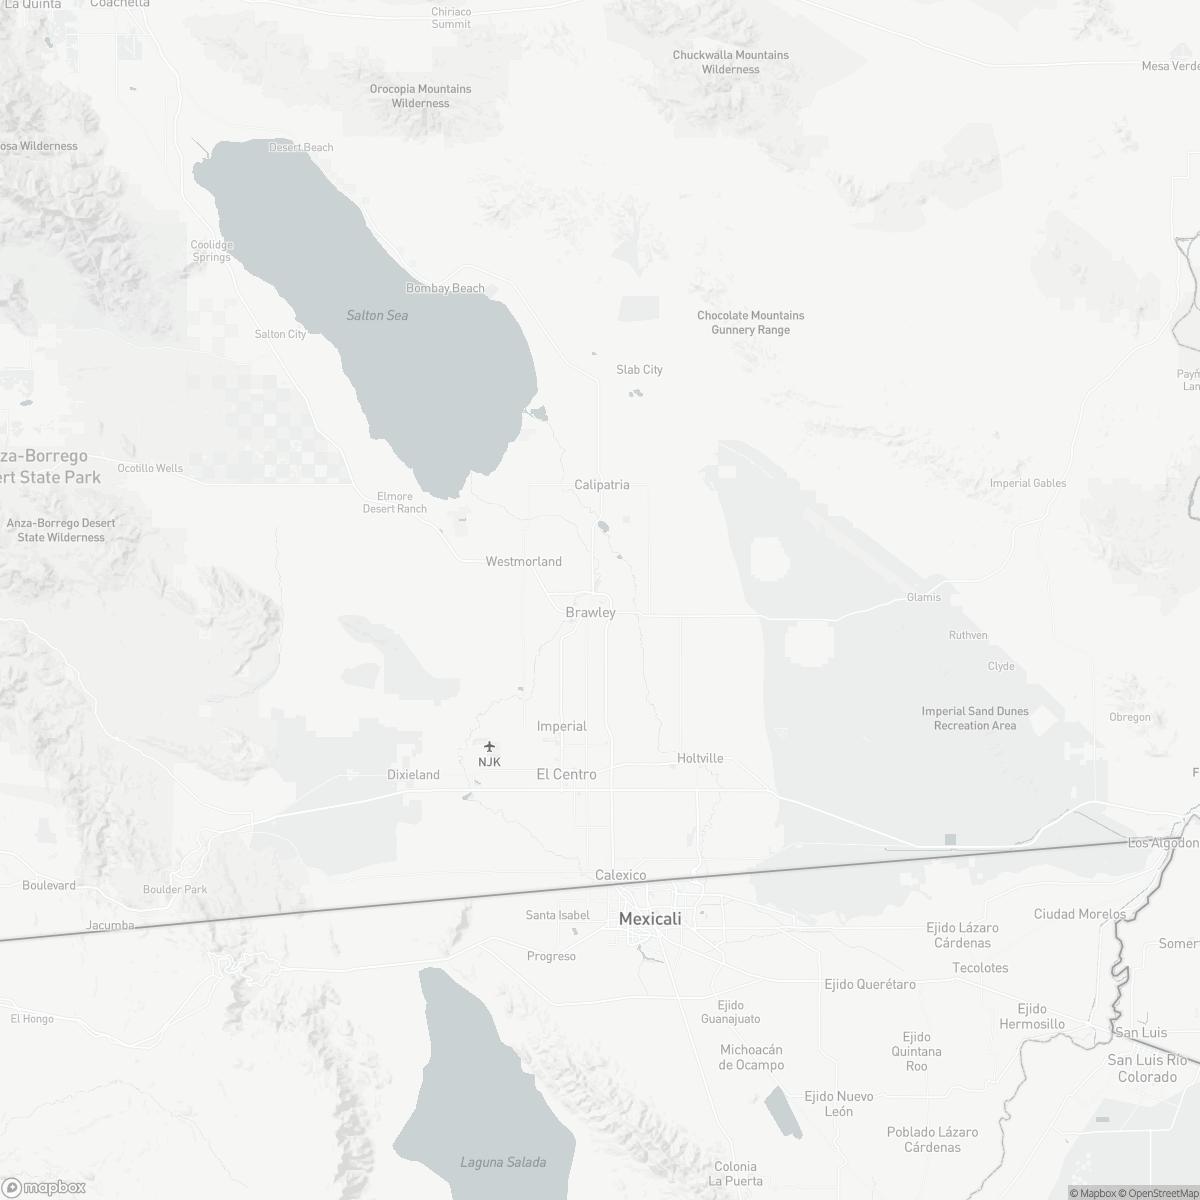 Map of Brawley Municipal Airport BWC surrounding area of Brawley California